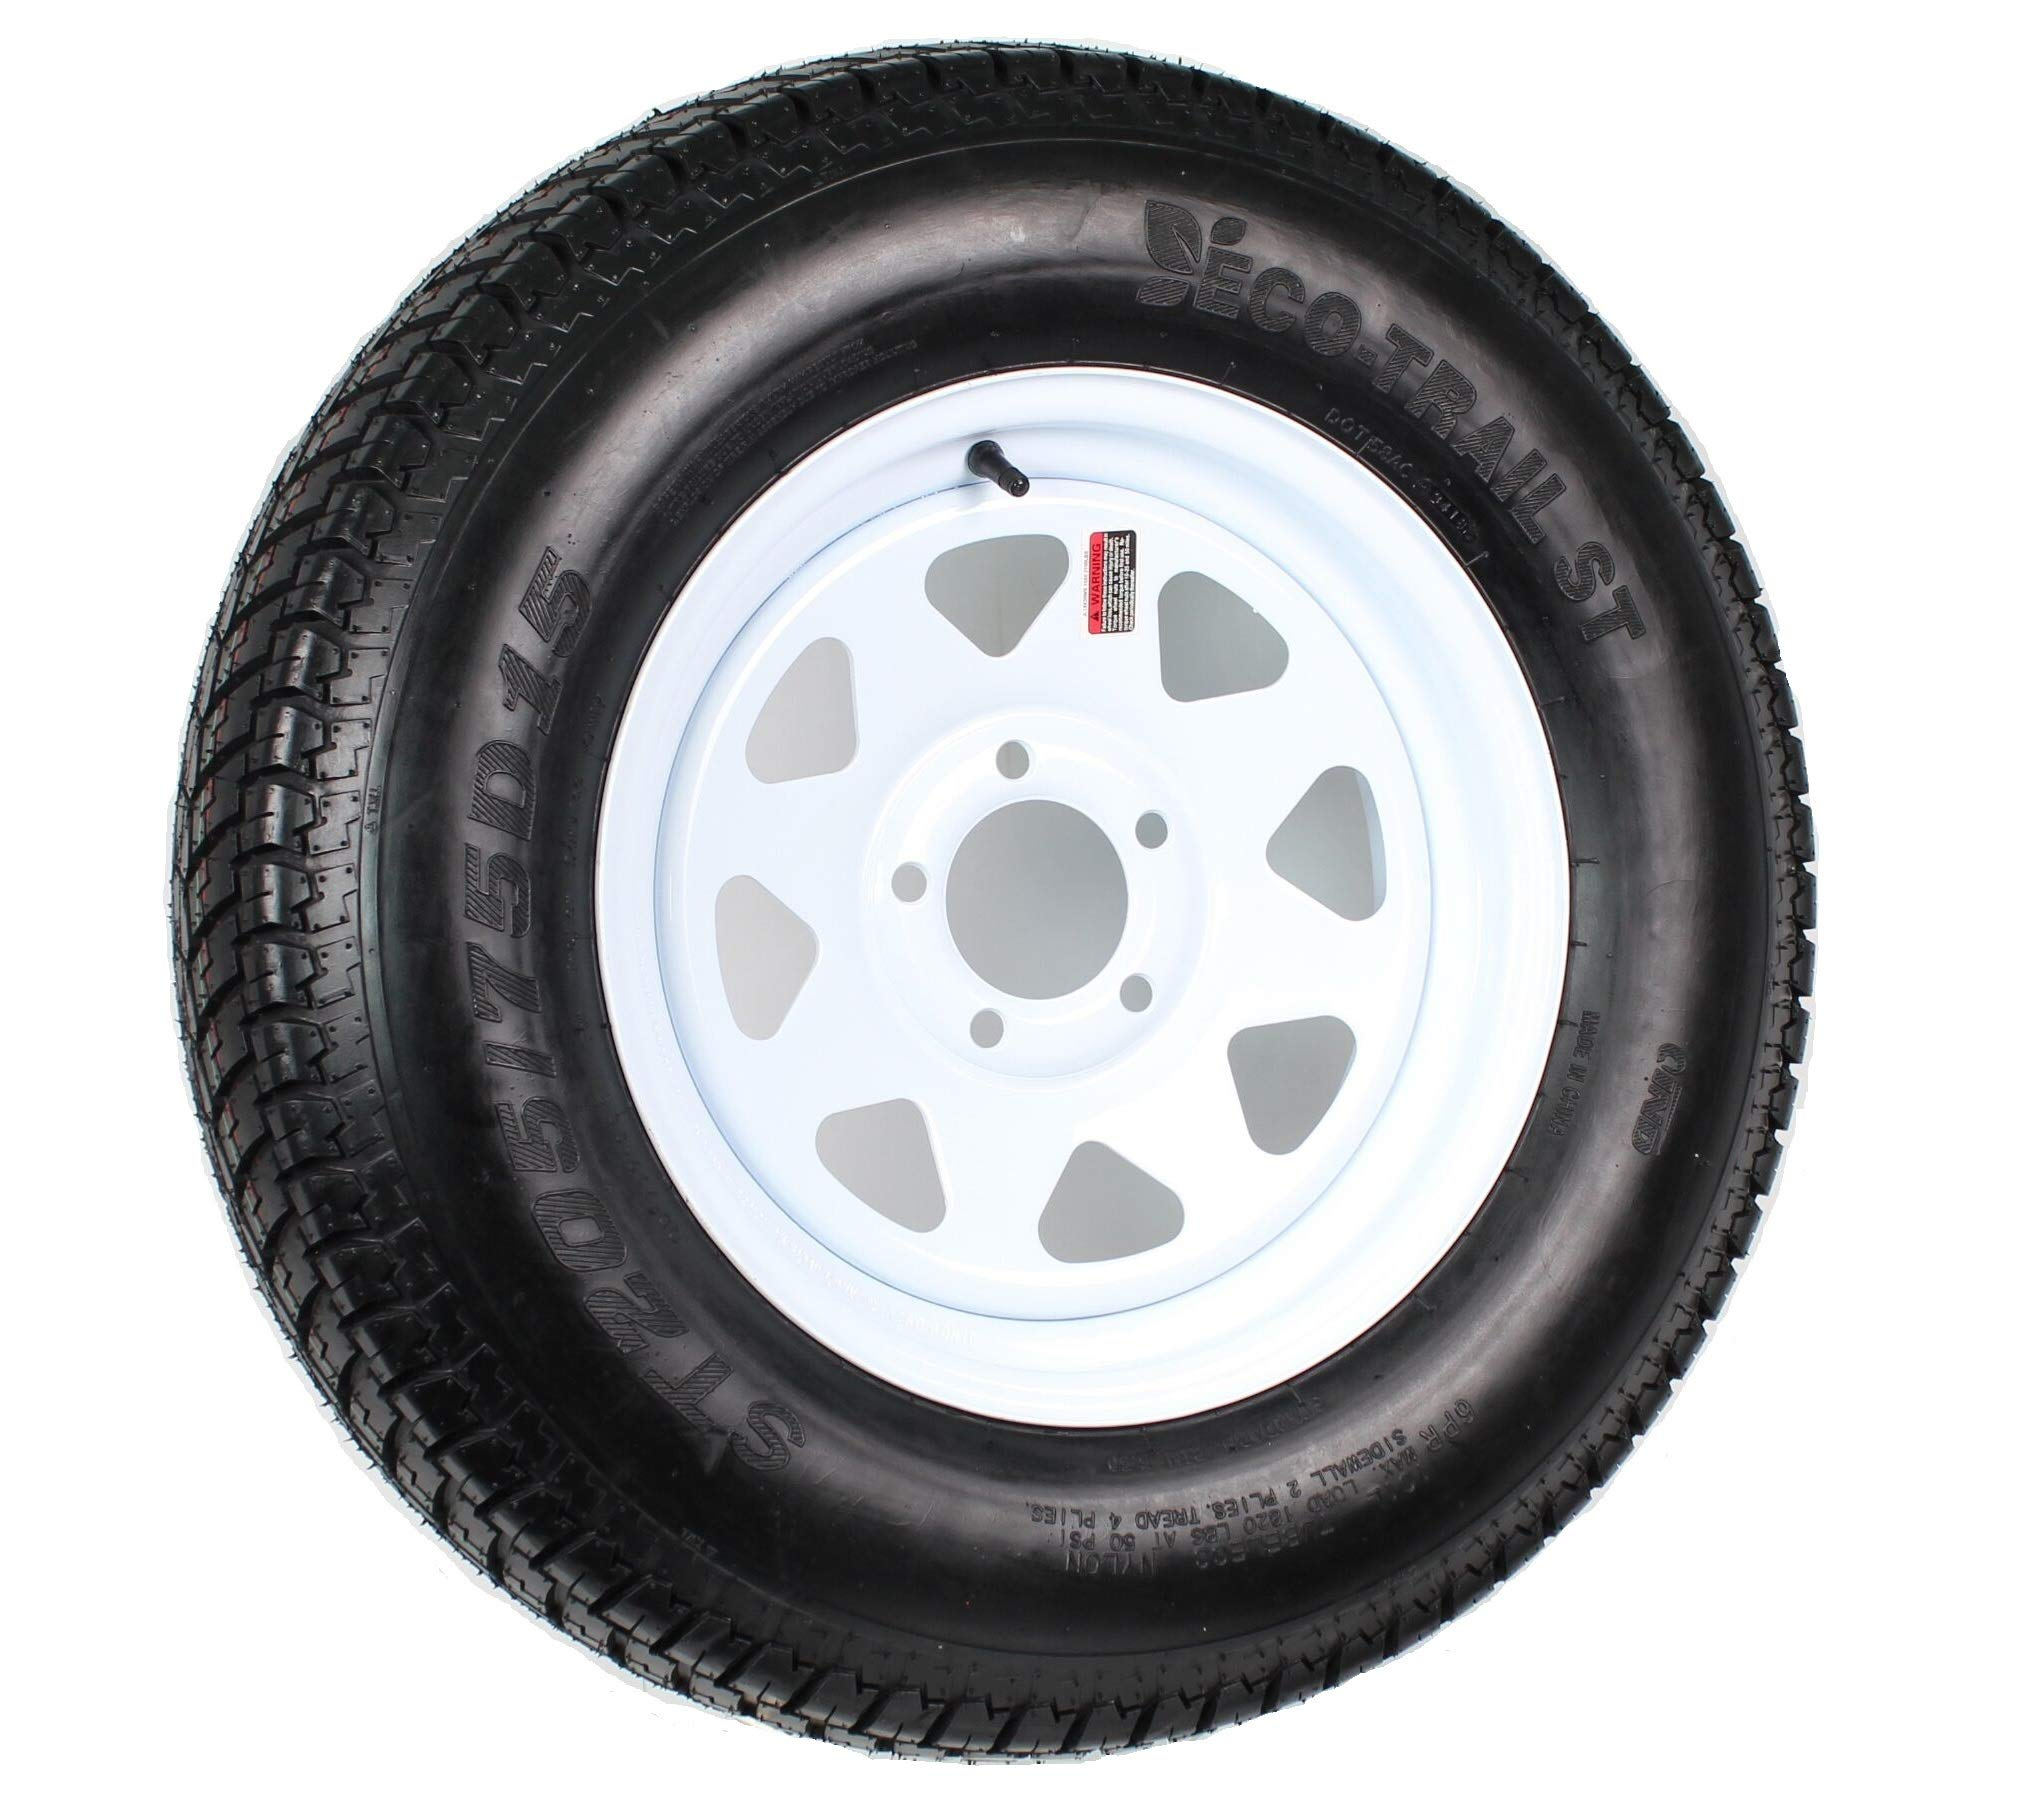 15'' White Spoke Trailer Wheel with Bias ST205/75D15 Tire Mounted (5x4.5) bolt circle